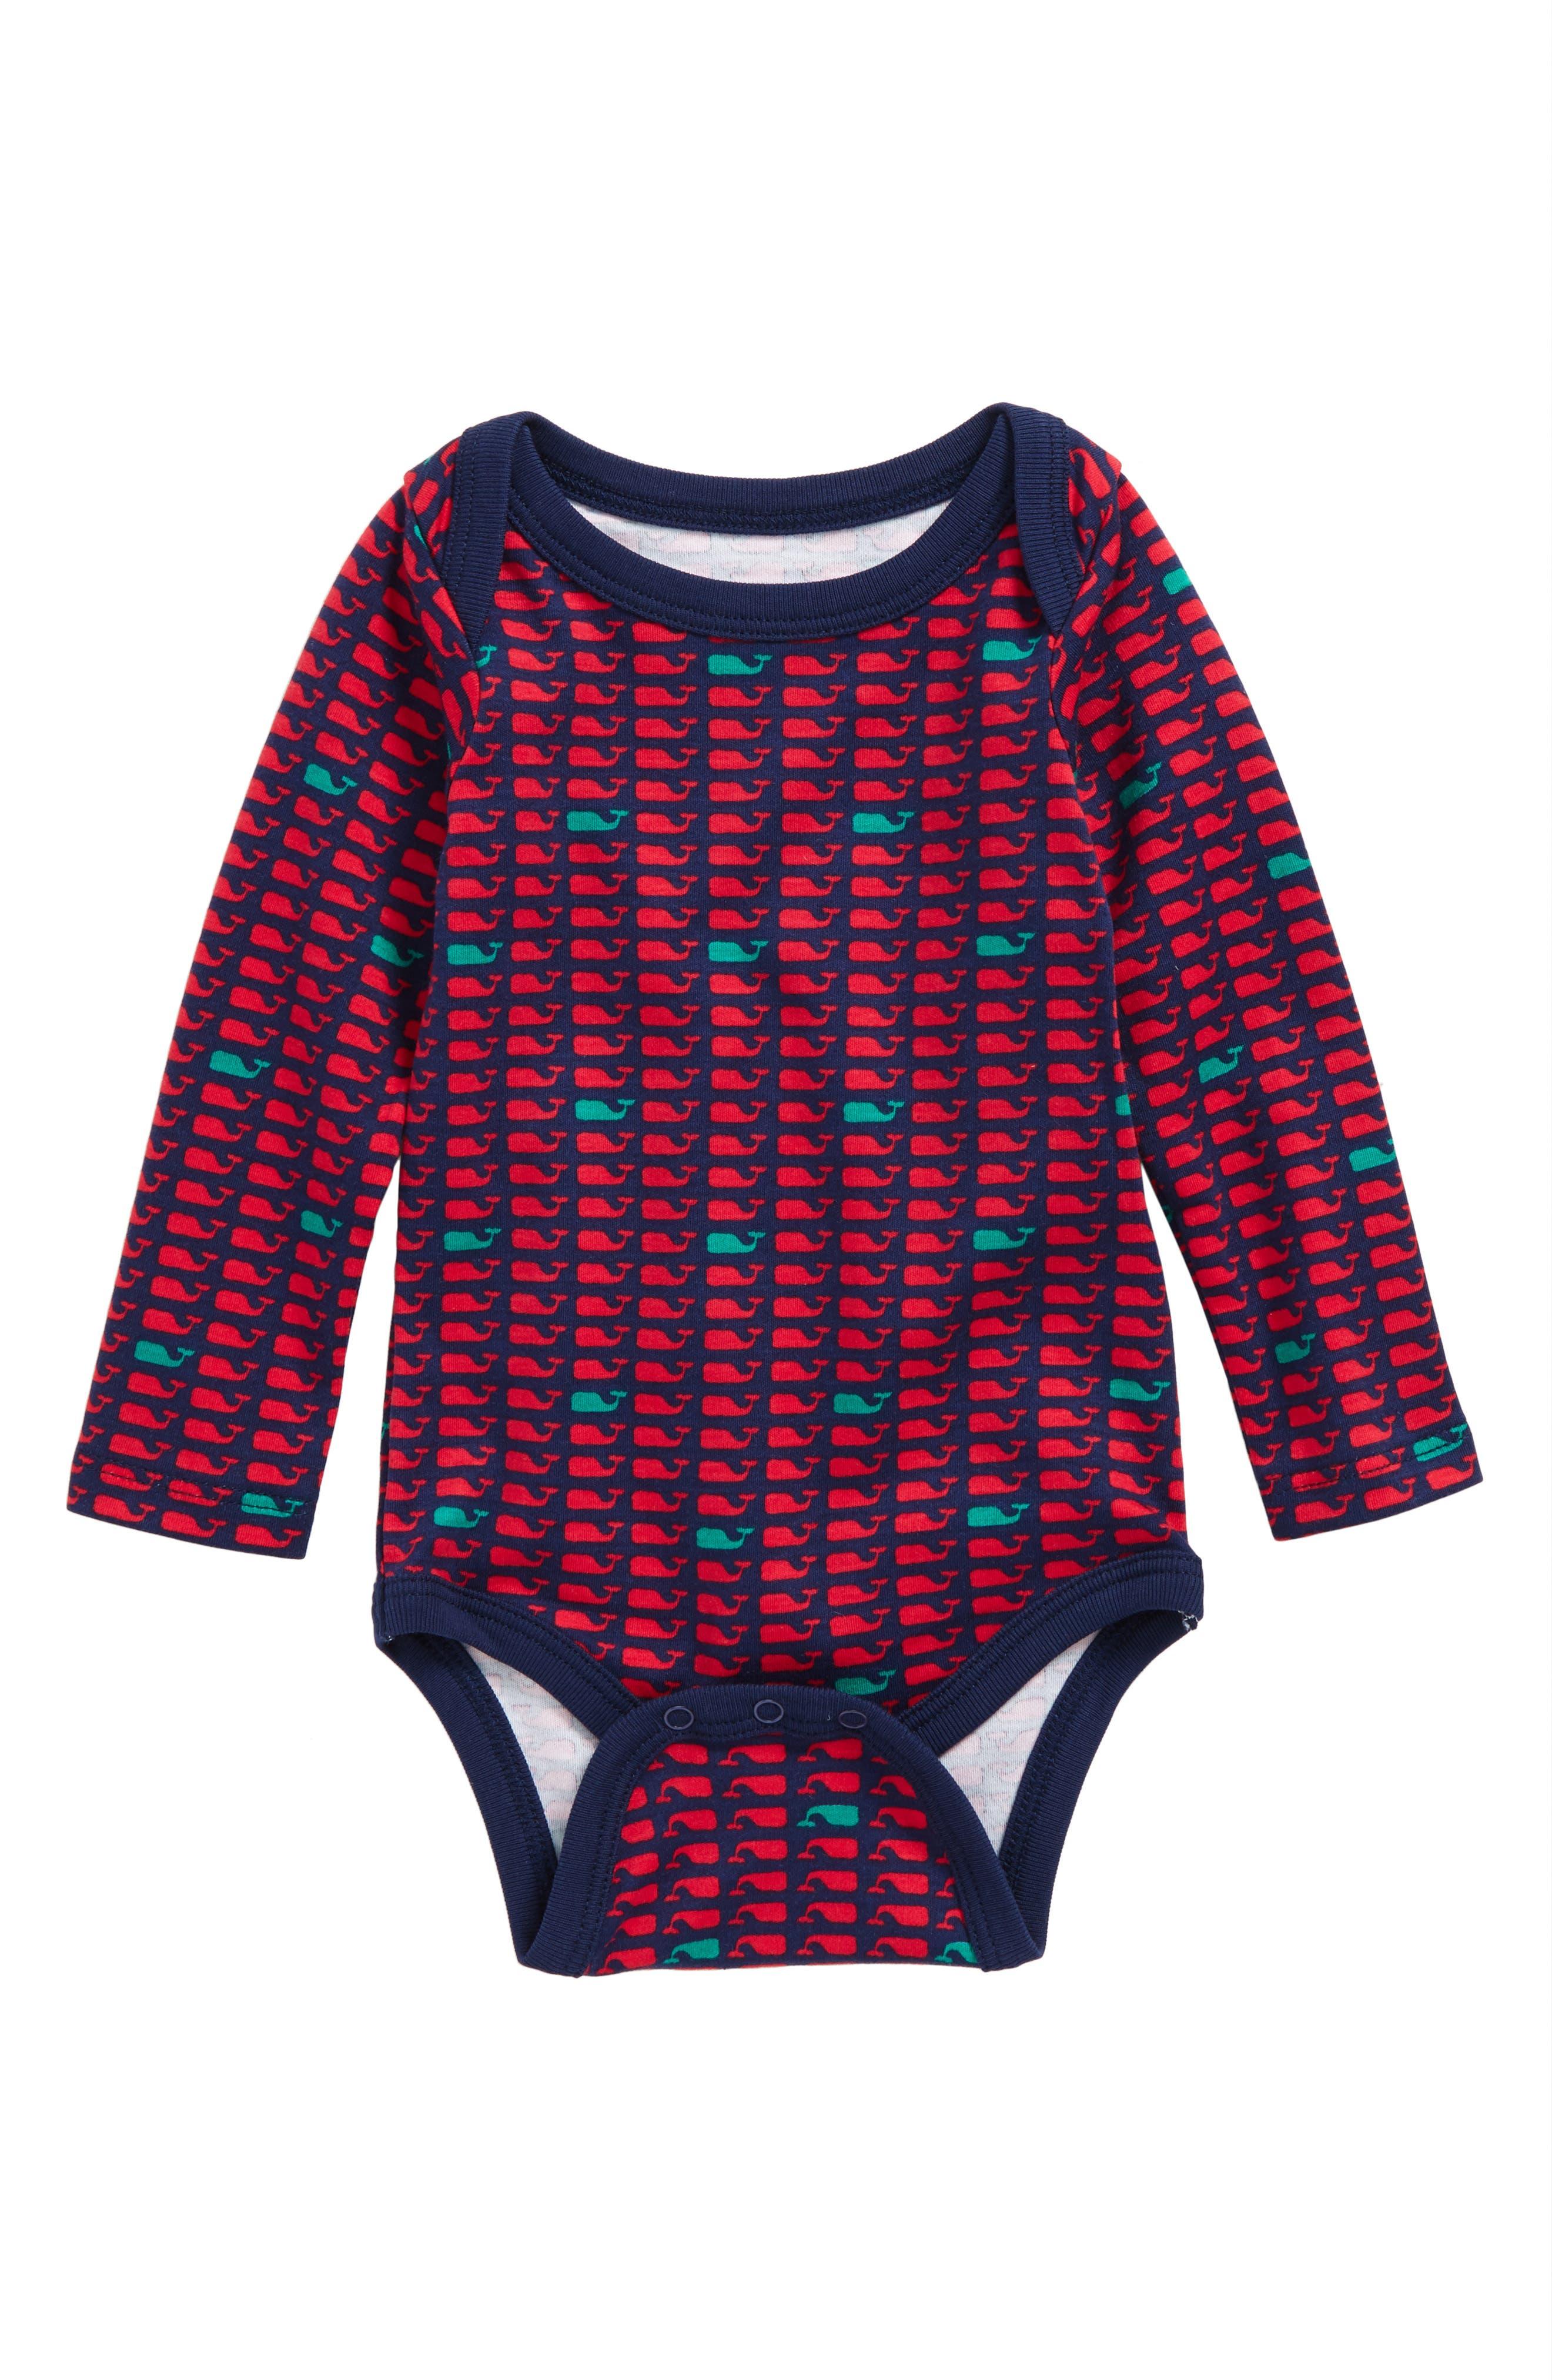 Main Image - vineyard vines Holiday Whale Bodysuit (Baby Girls)